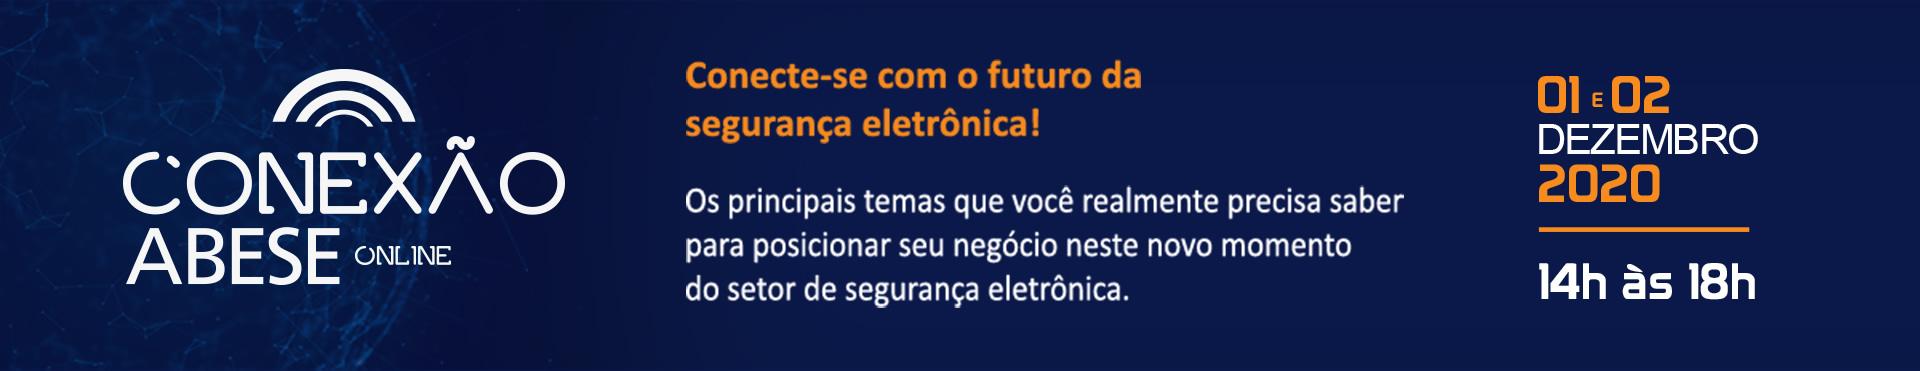 Conexão ABESE Online